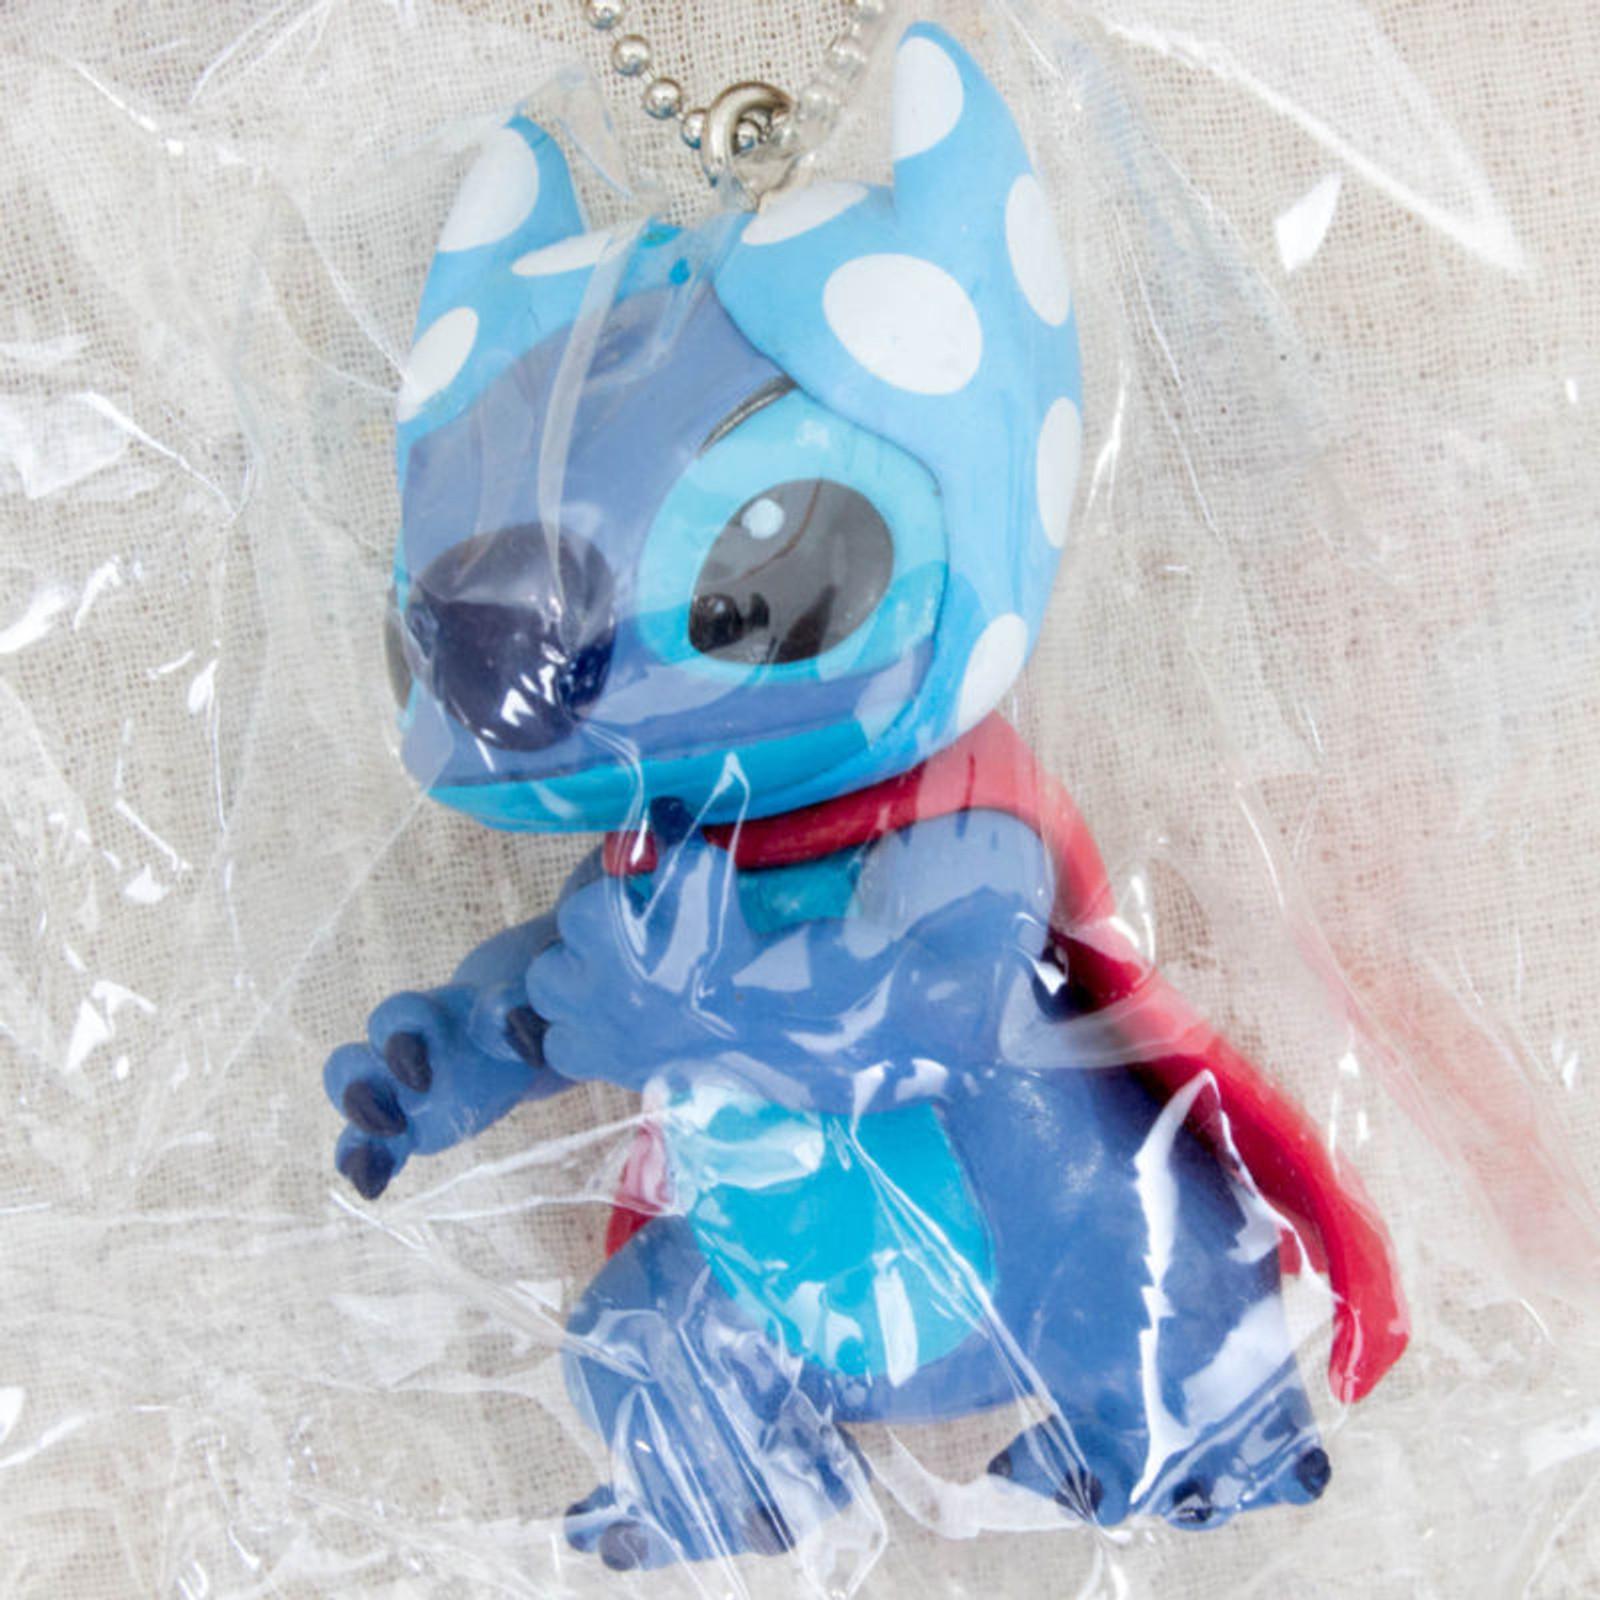 Disney Stitch with Scarf Mascot Figure Strap SEGA JAPAN ANIME